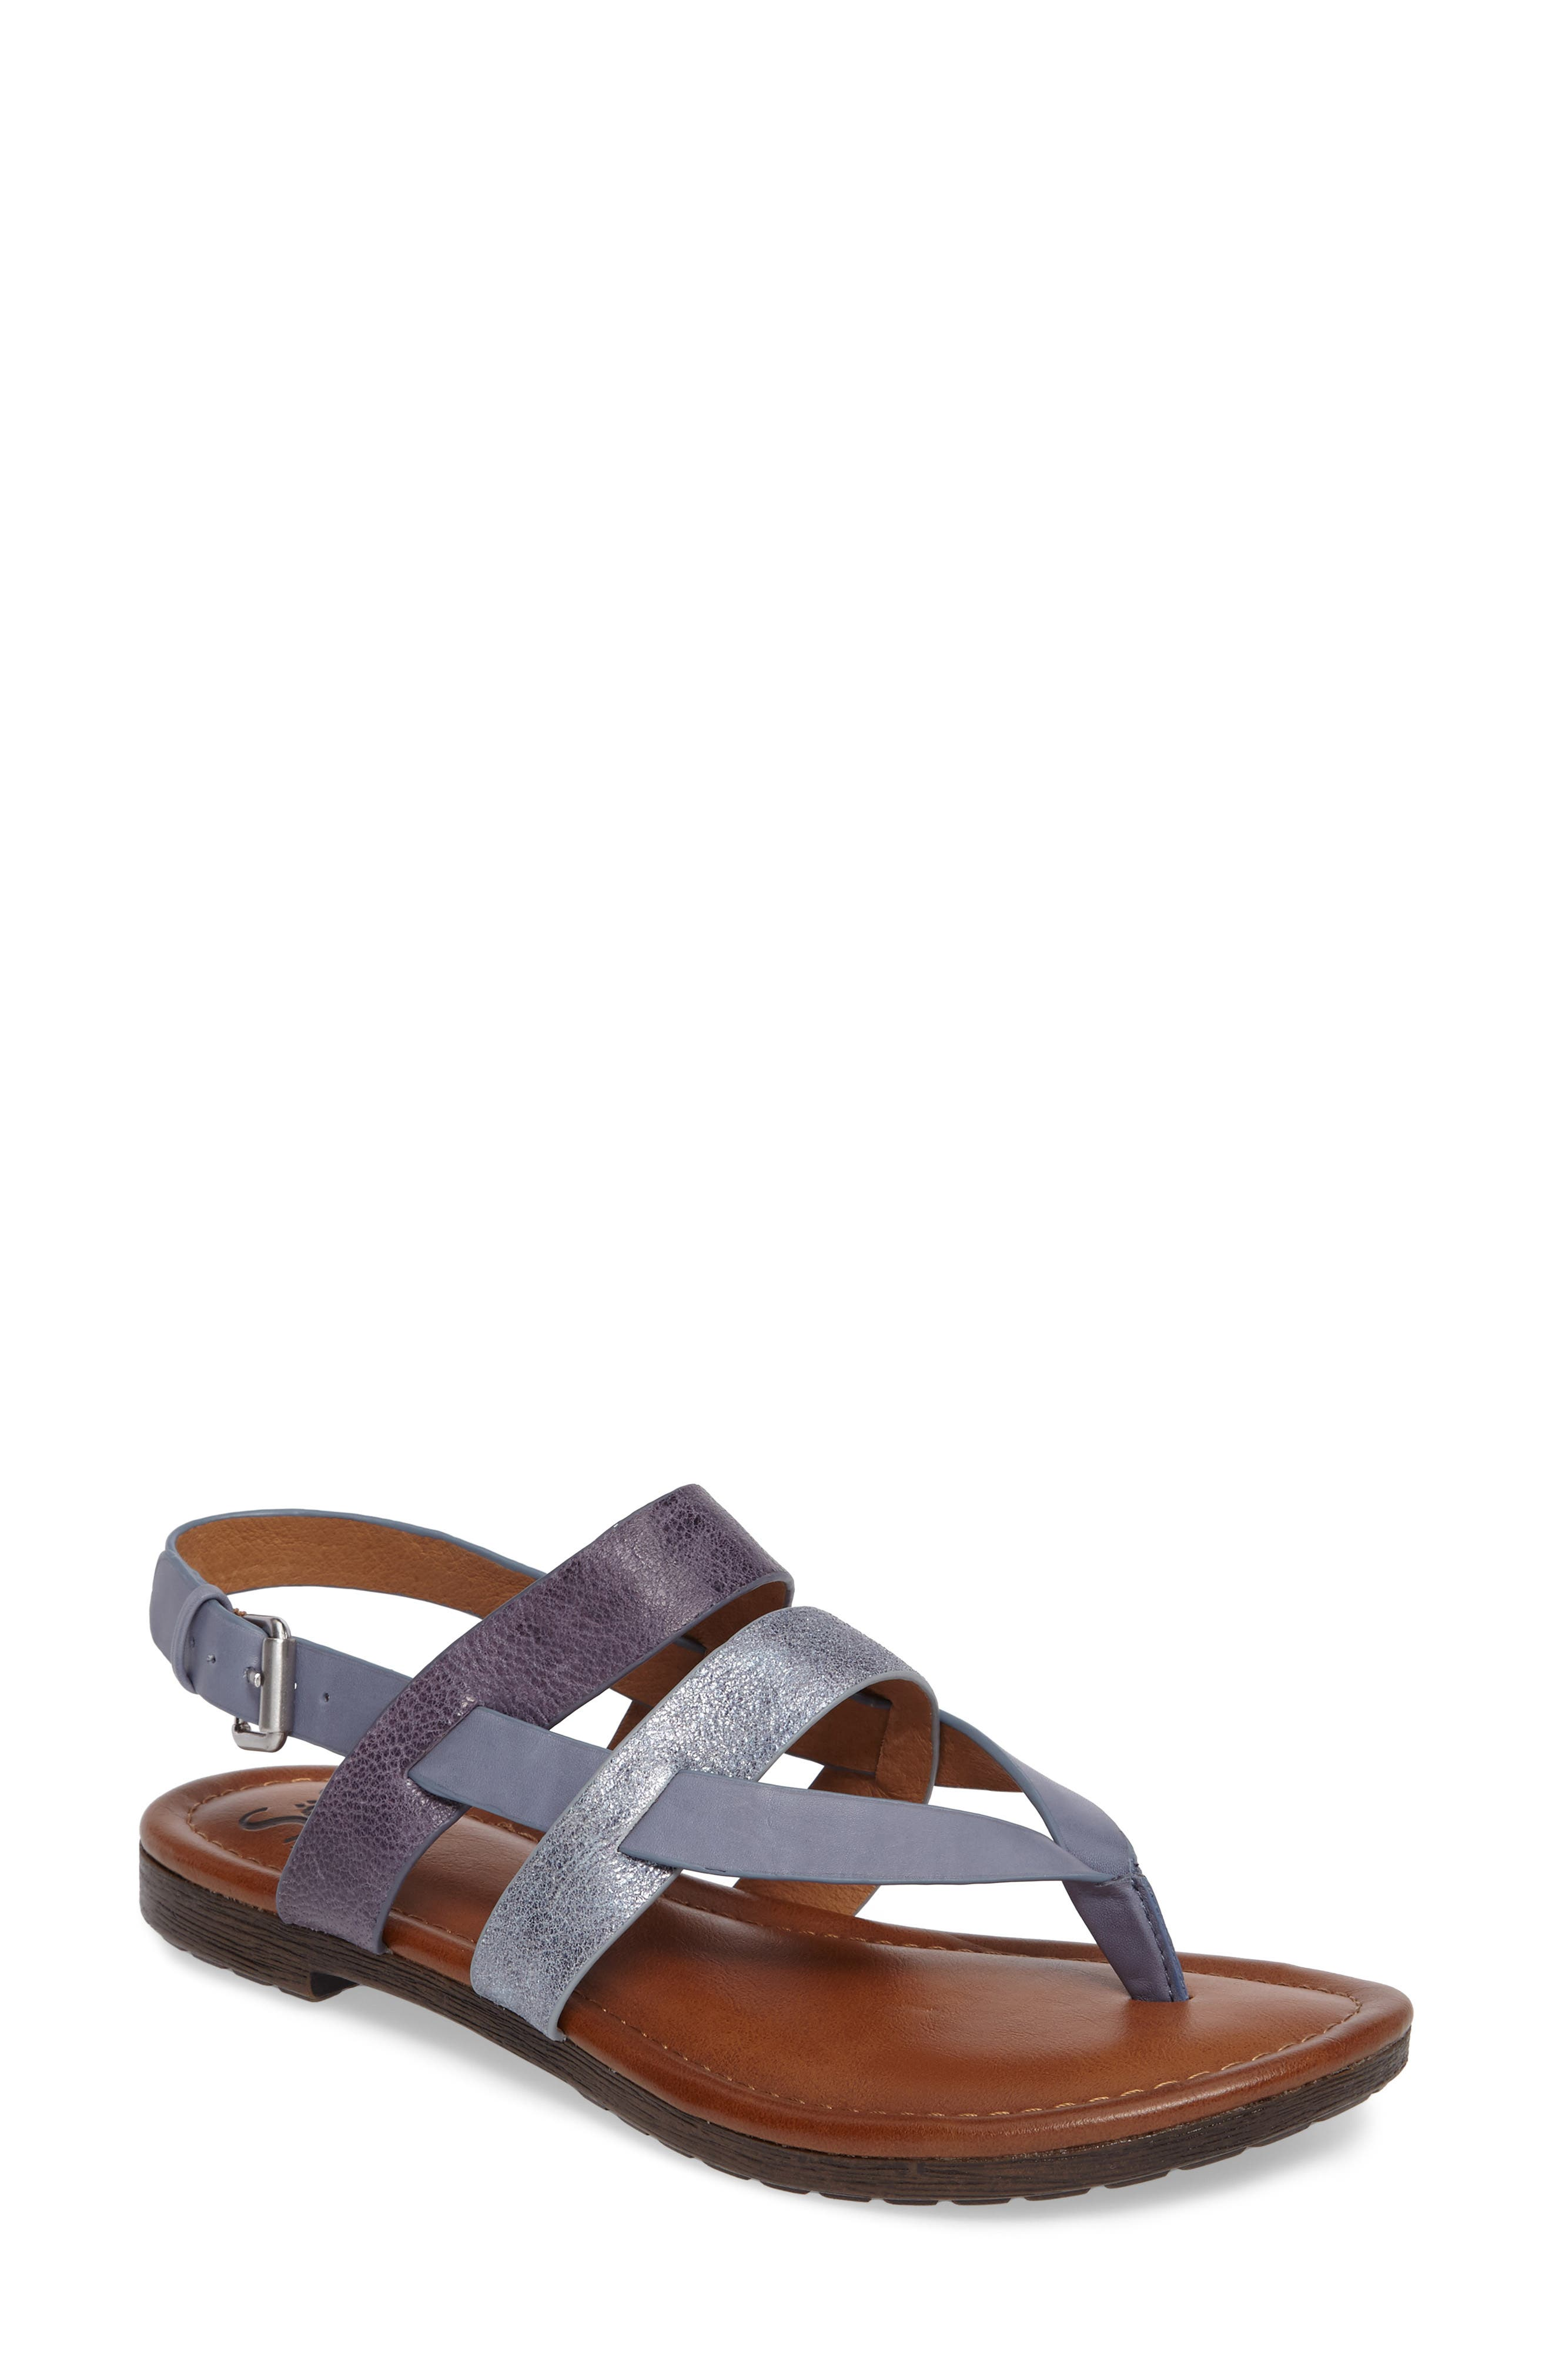 Bena Strappy Sandal,                             Main thumbnail 1, color,